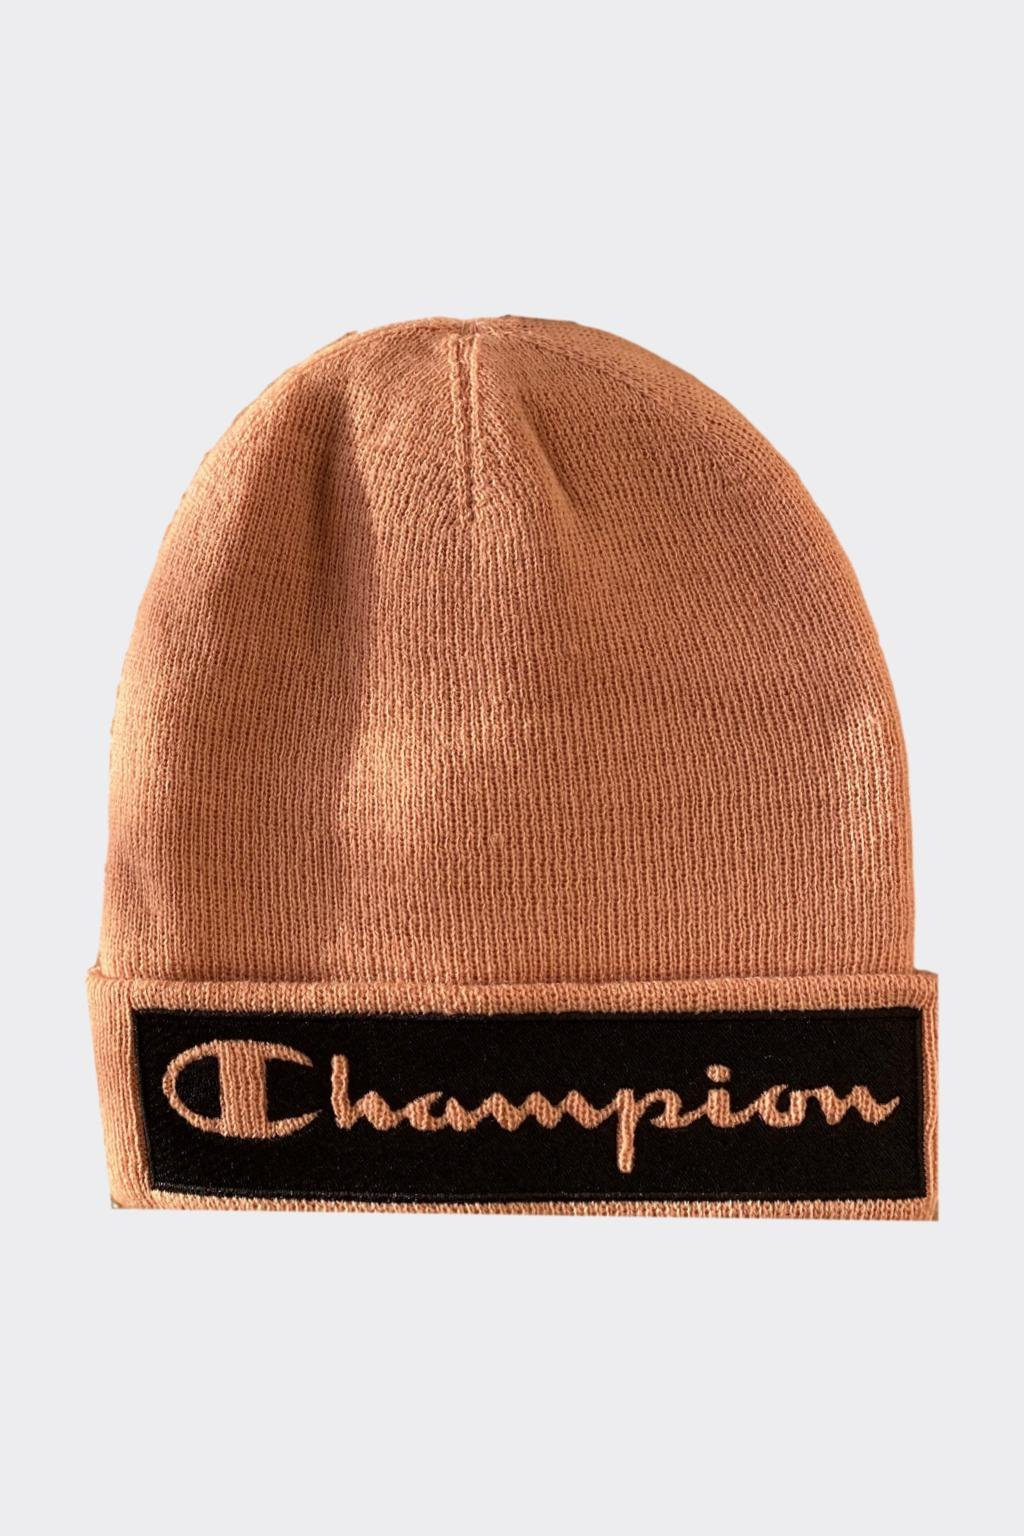 Champion čepice beanie dámská - růžová